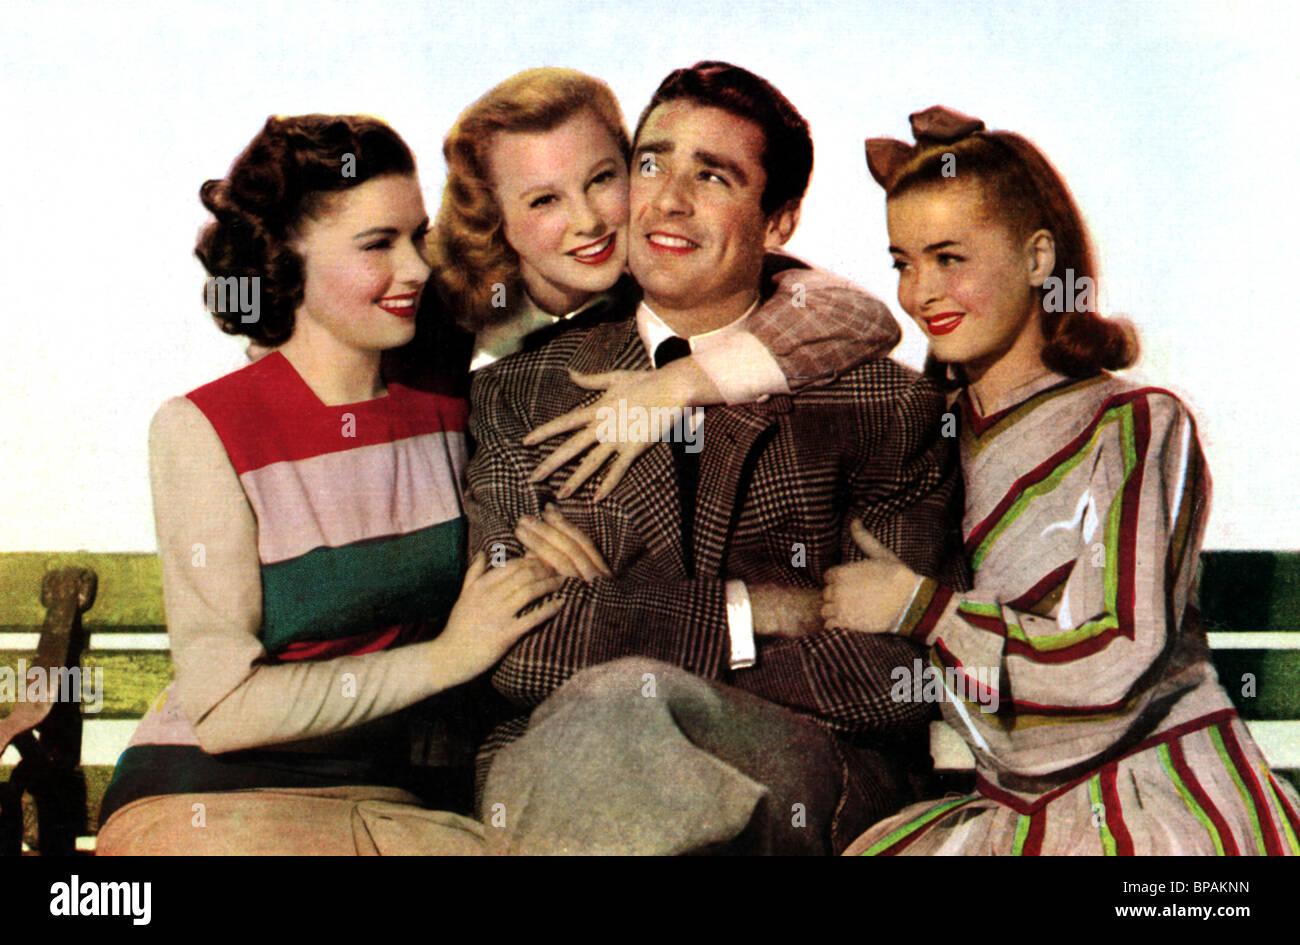 PATRICIA MARSHALL, JUNE ALLYSON, PETER LAWFORD, JOAN MCCRACKEN, GOOD NEWS, 1947 - Stock Image